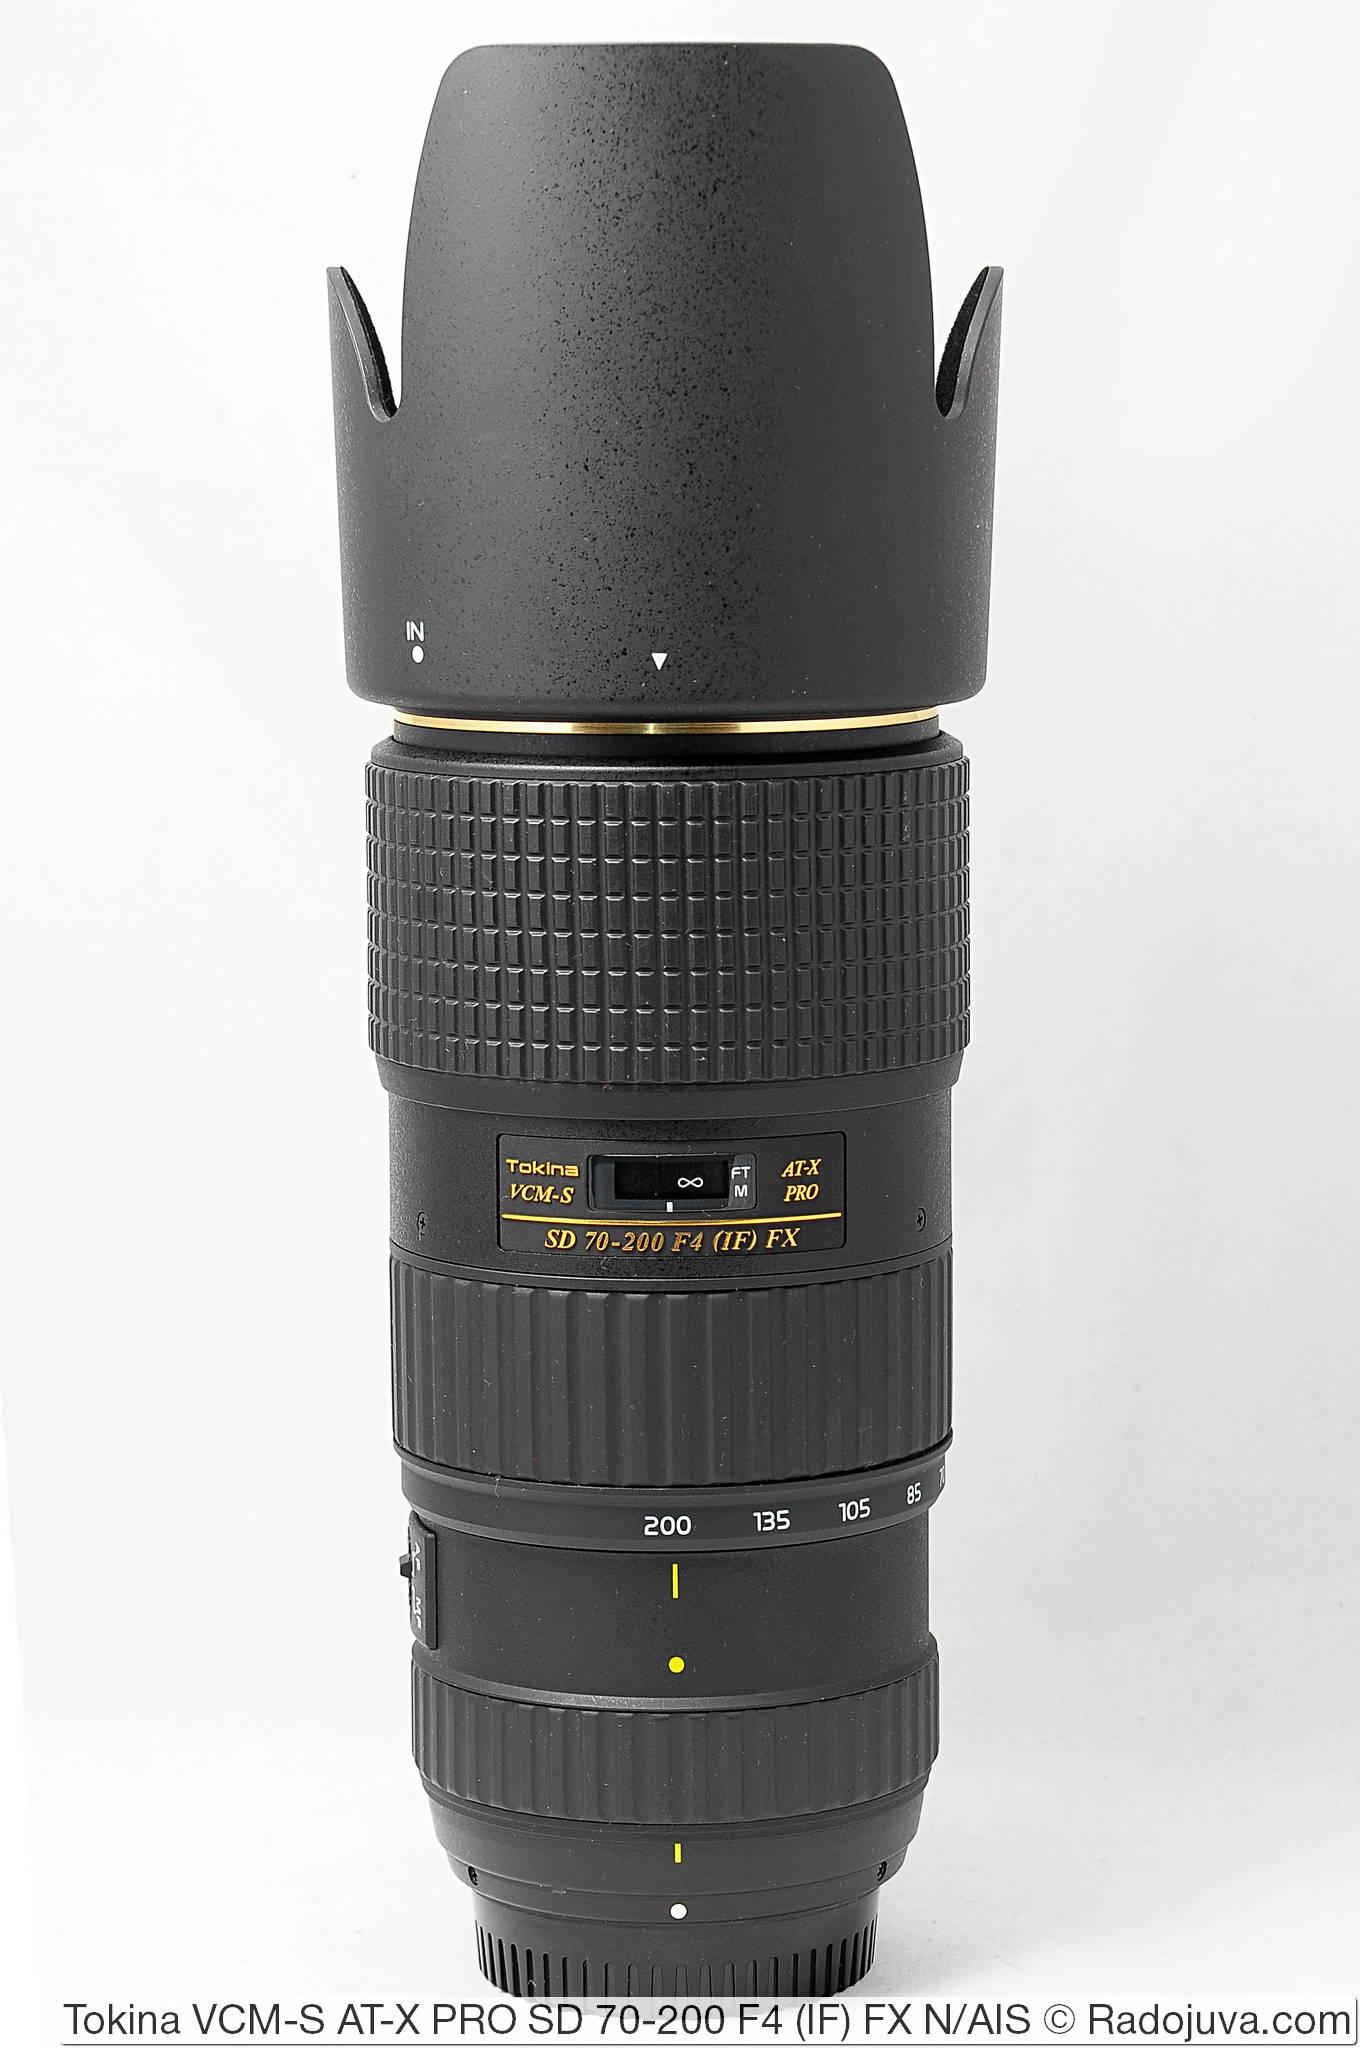 Tokina VCM-S AT-X PRO SD 70-200 F4 (IF) FX с блендой BH-672